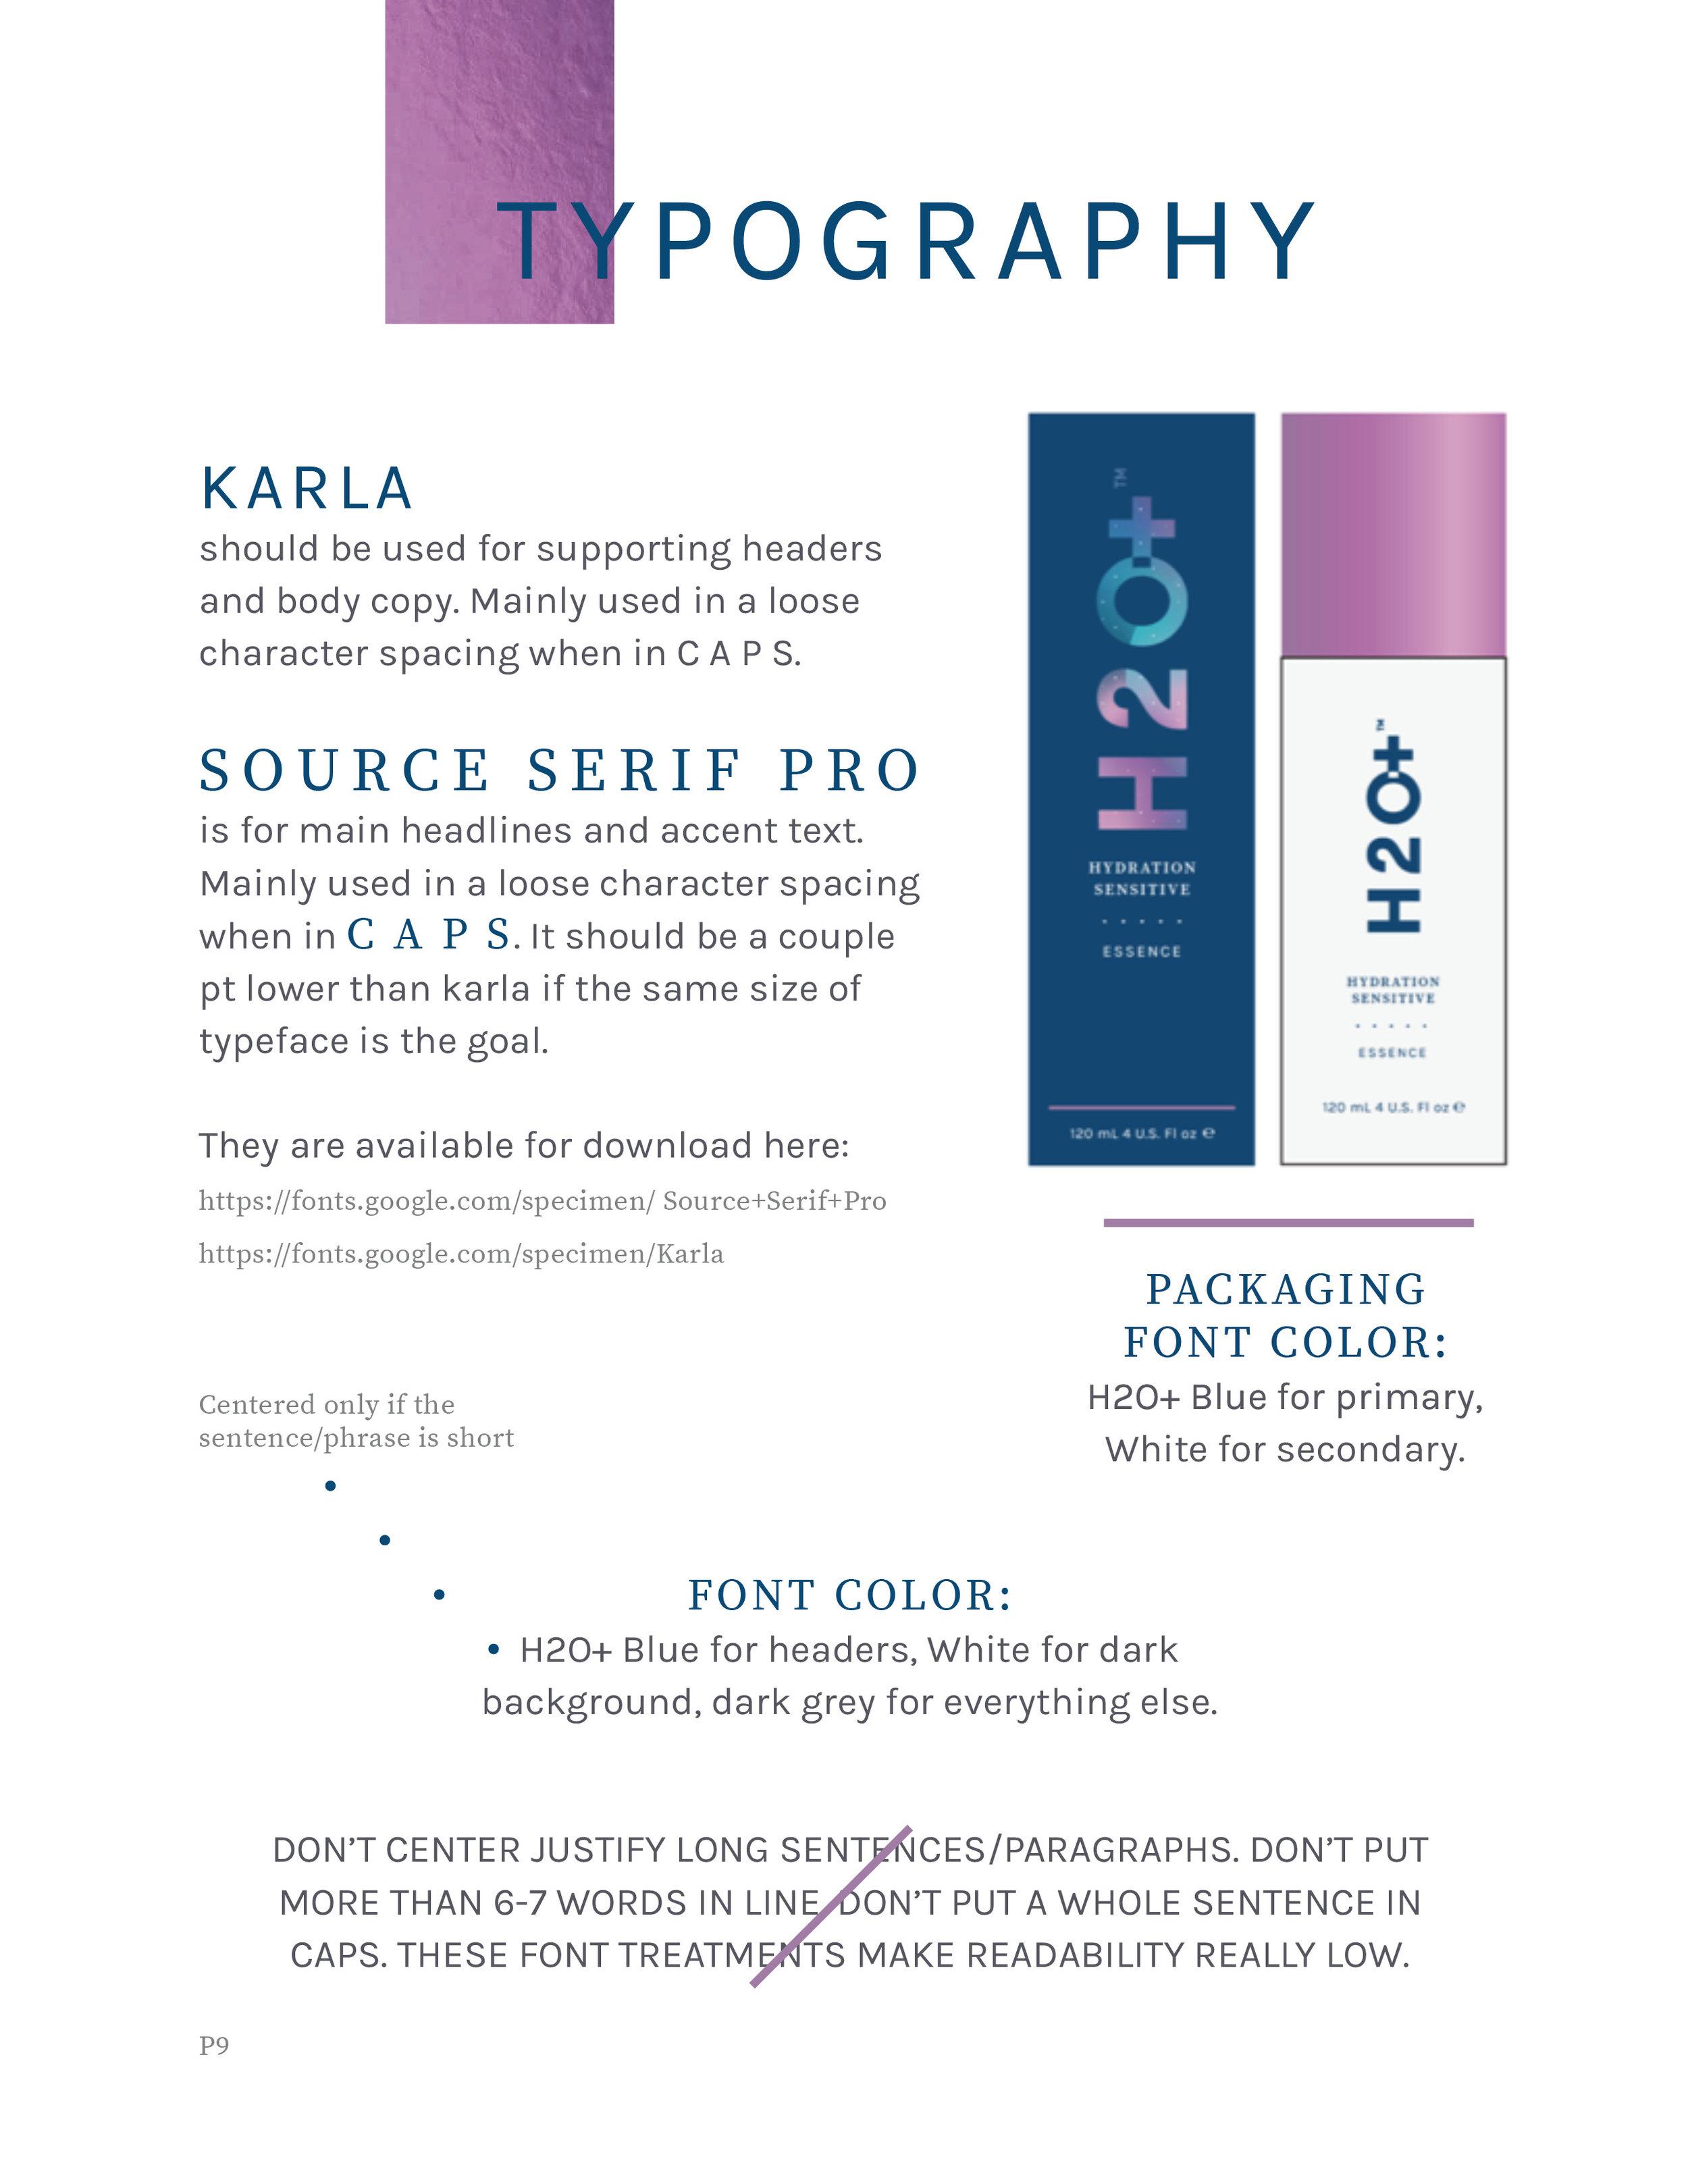 H2O+ Brand Style Guide_0405199.jpg